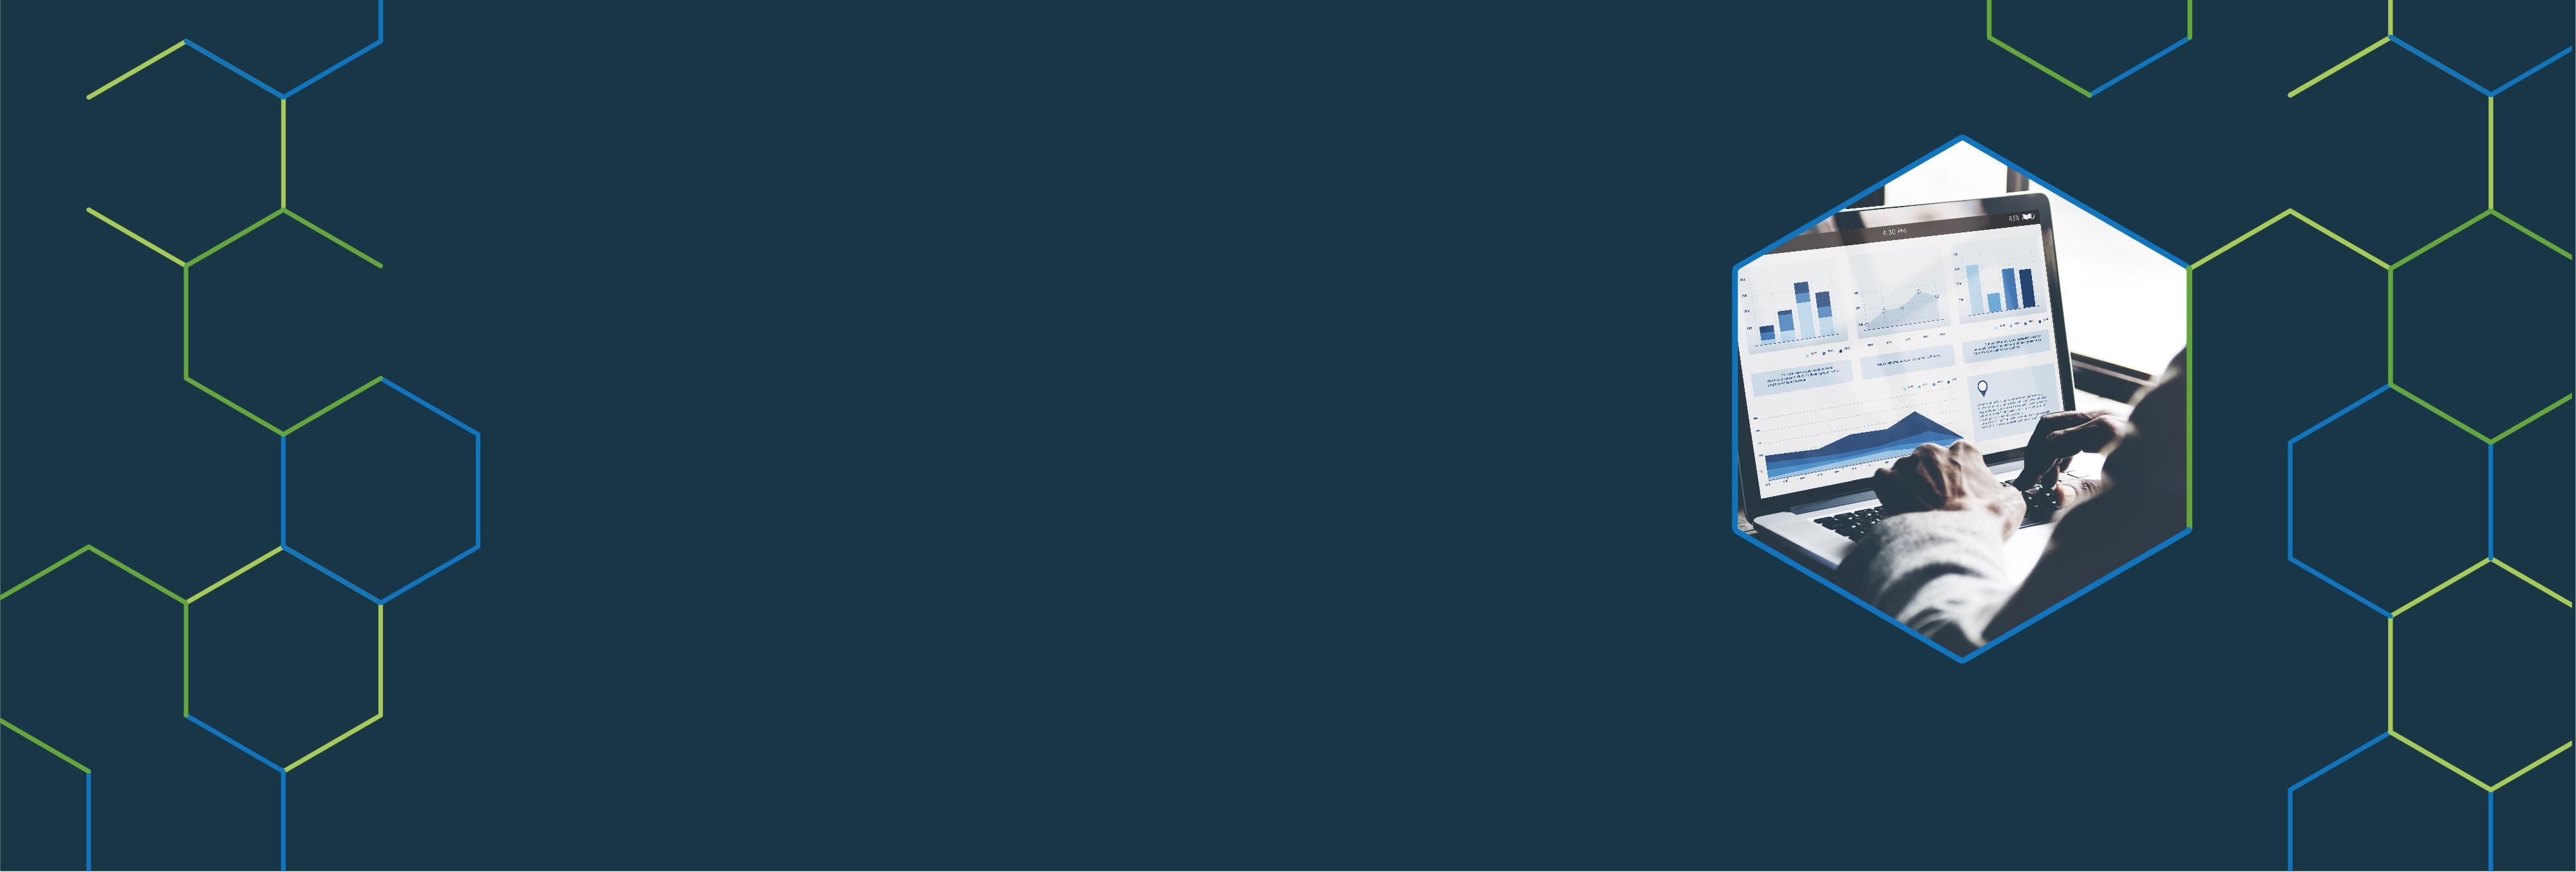 SHS_Webinar-betrugspraevention-1920x650px-2019-06-07